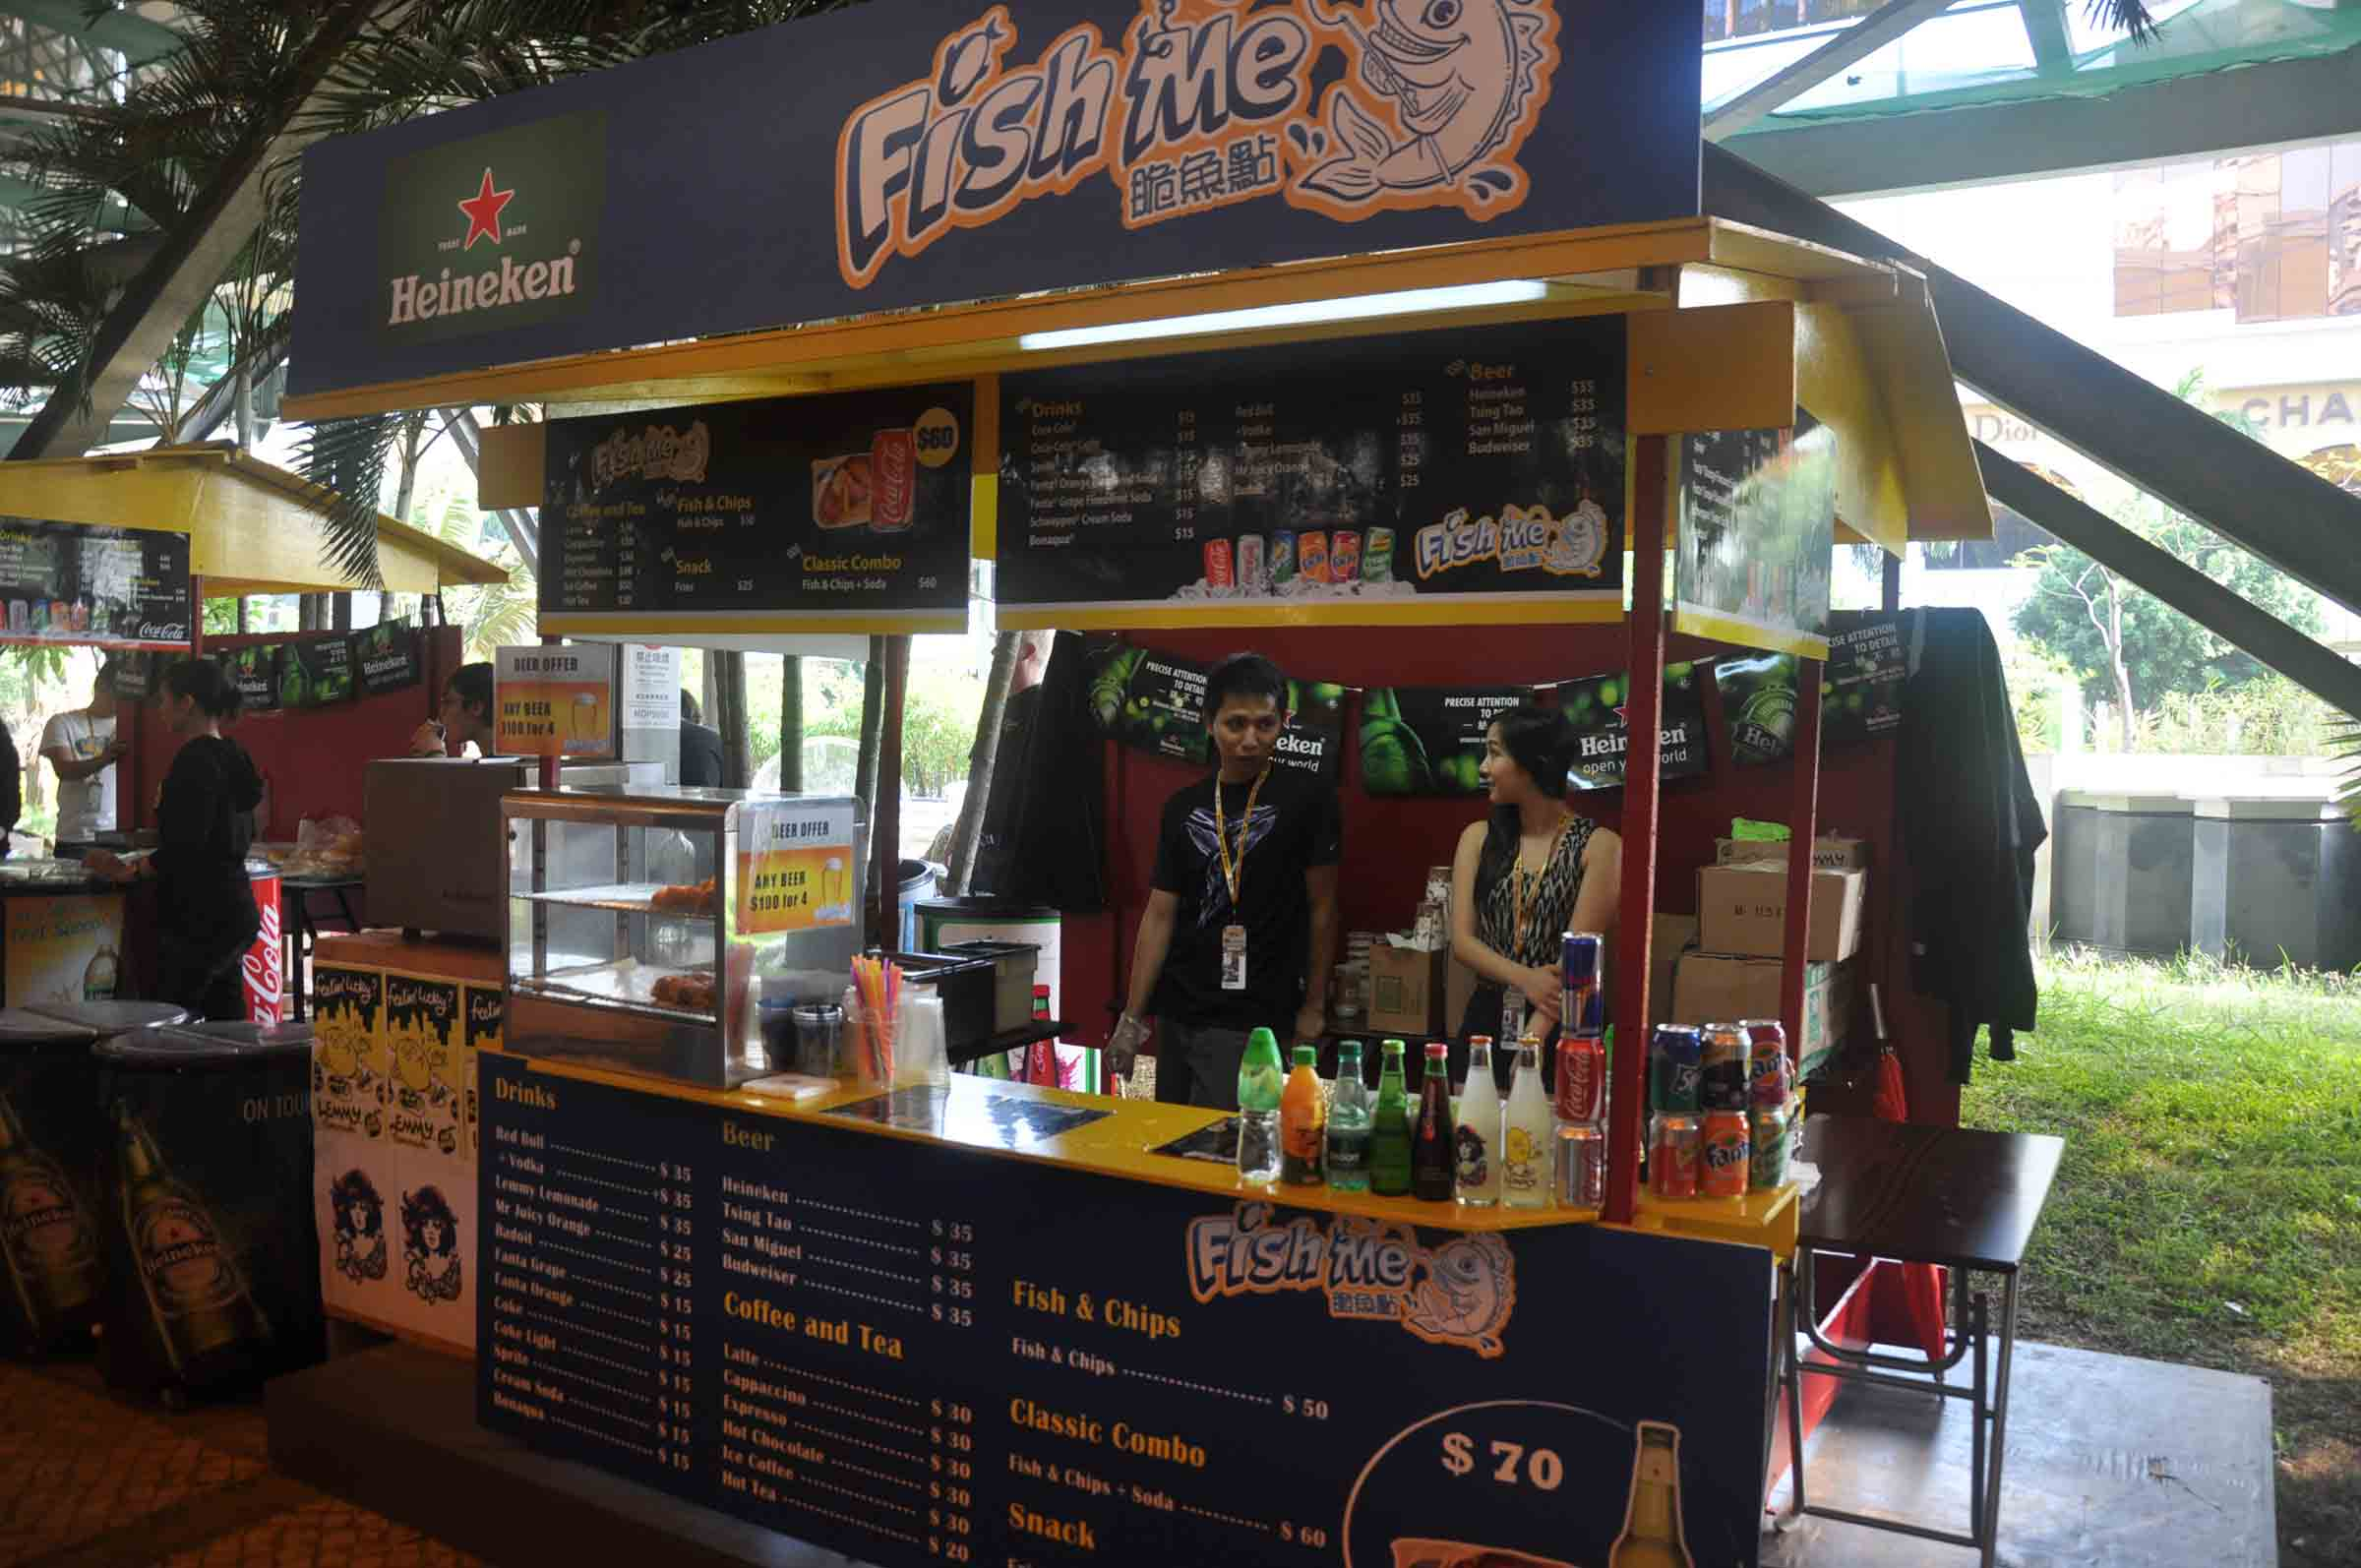 Macau F3 Grand Prix Race food booth